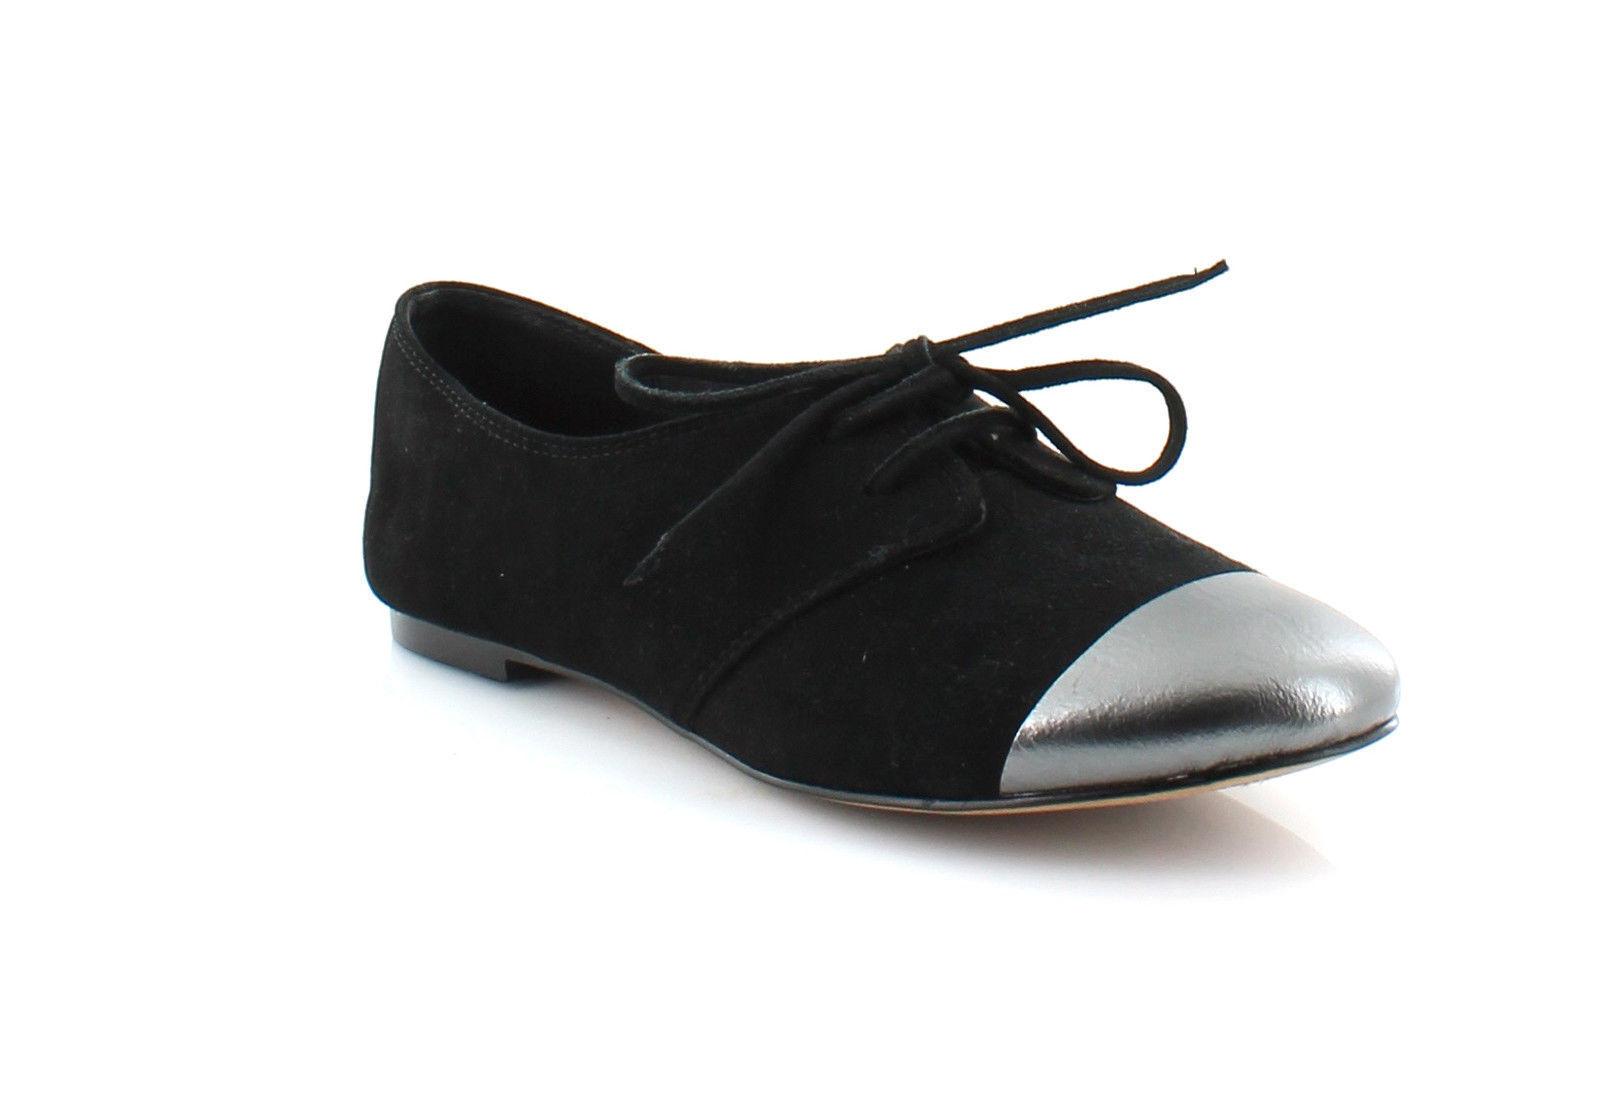 160 Splendid Nickerie Womens Suede Designer Oxford shoes, Black, New NIB